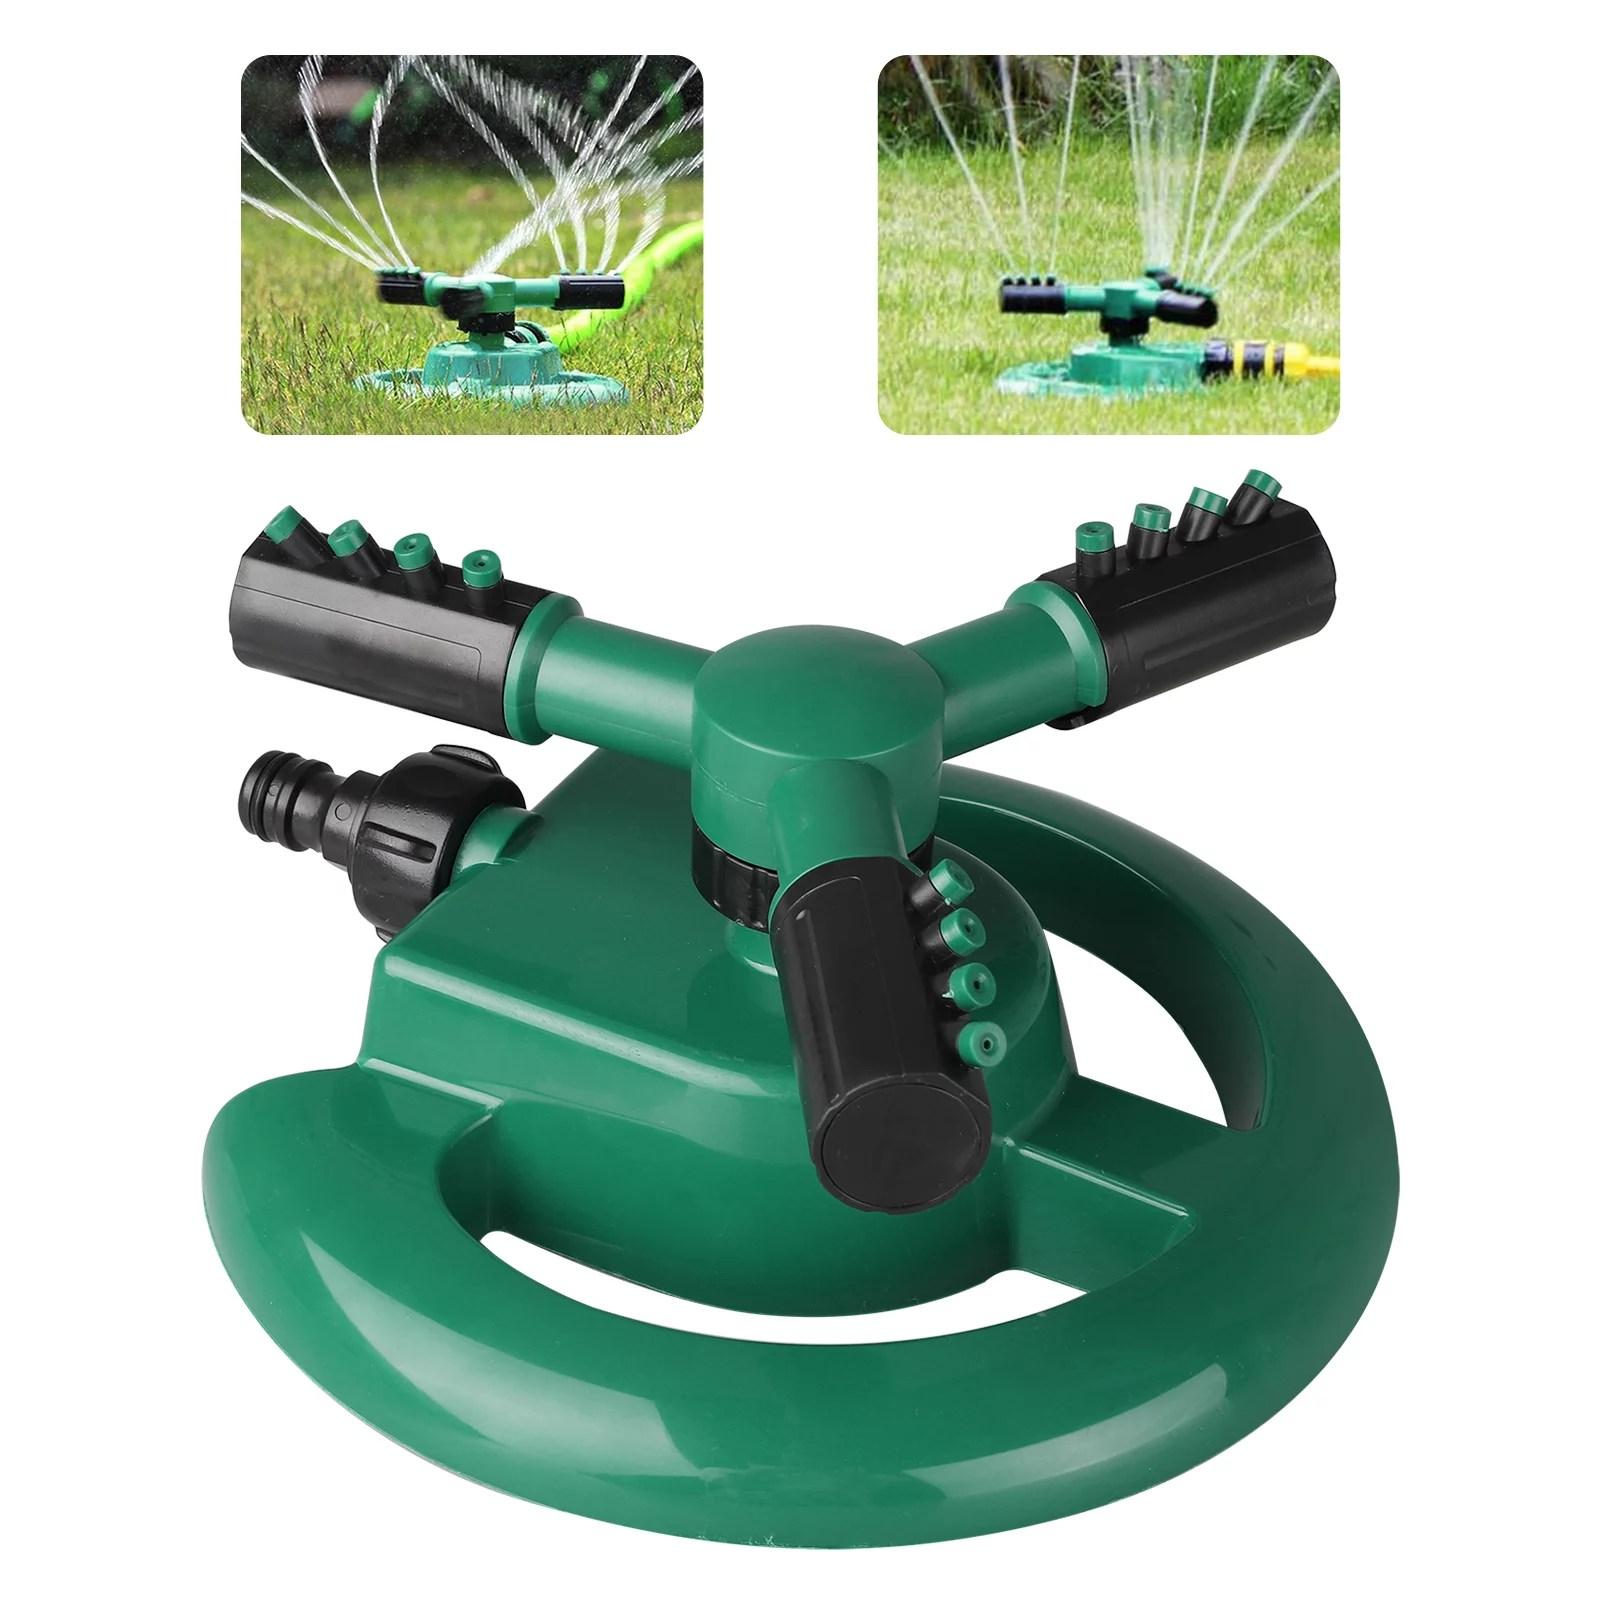 Lawn Sprinkler Automatic Sprinklers For Garden Water